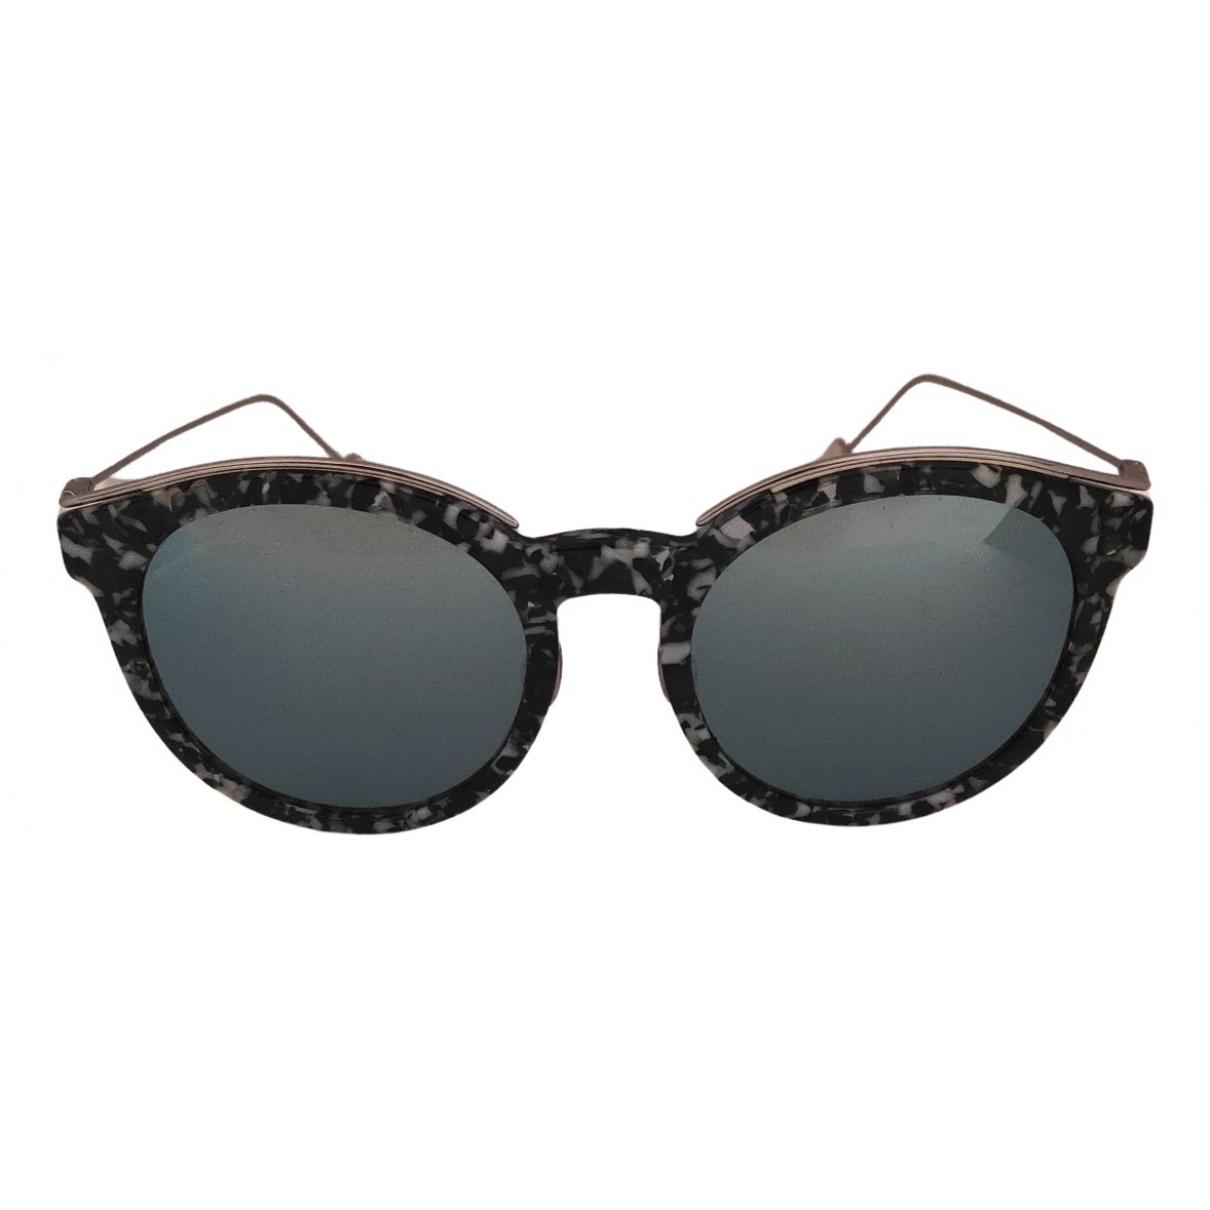 Christian Dior N Multicolour Sunglasses for Women N